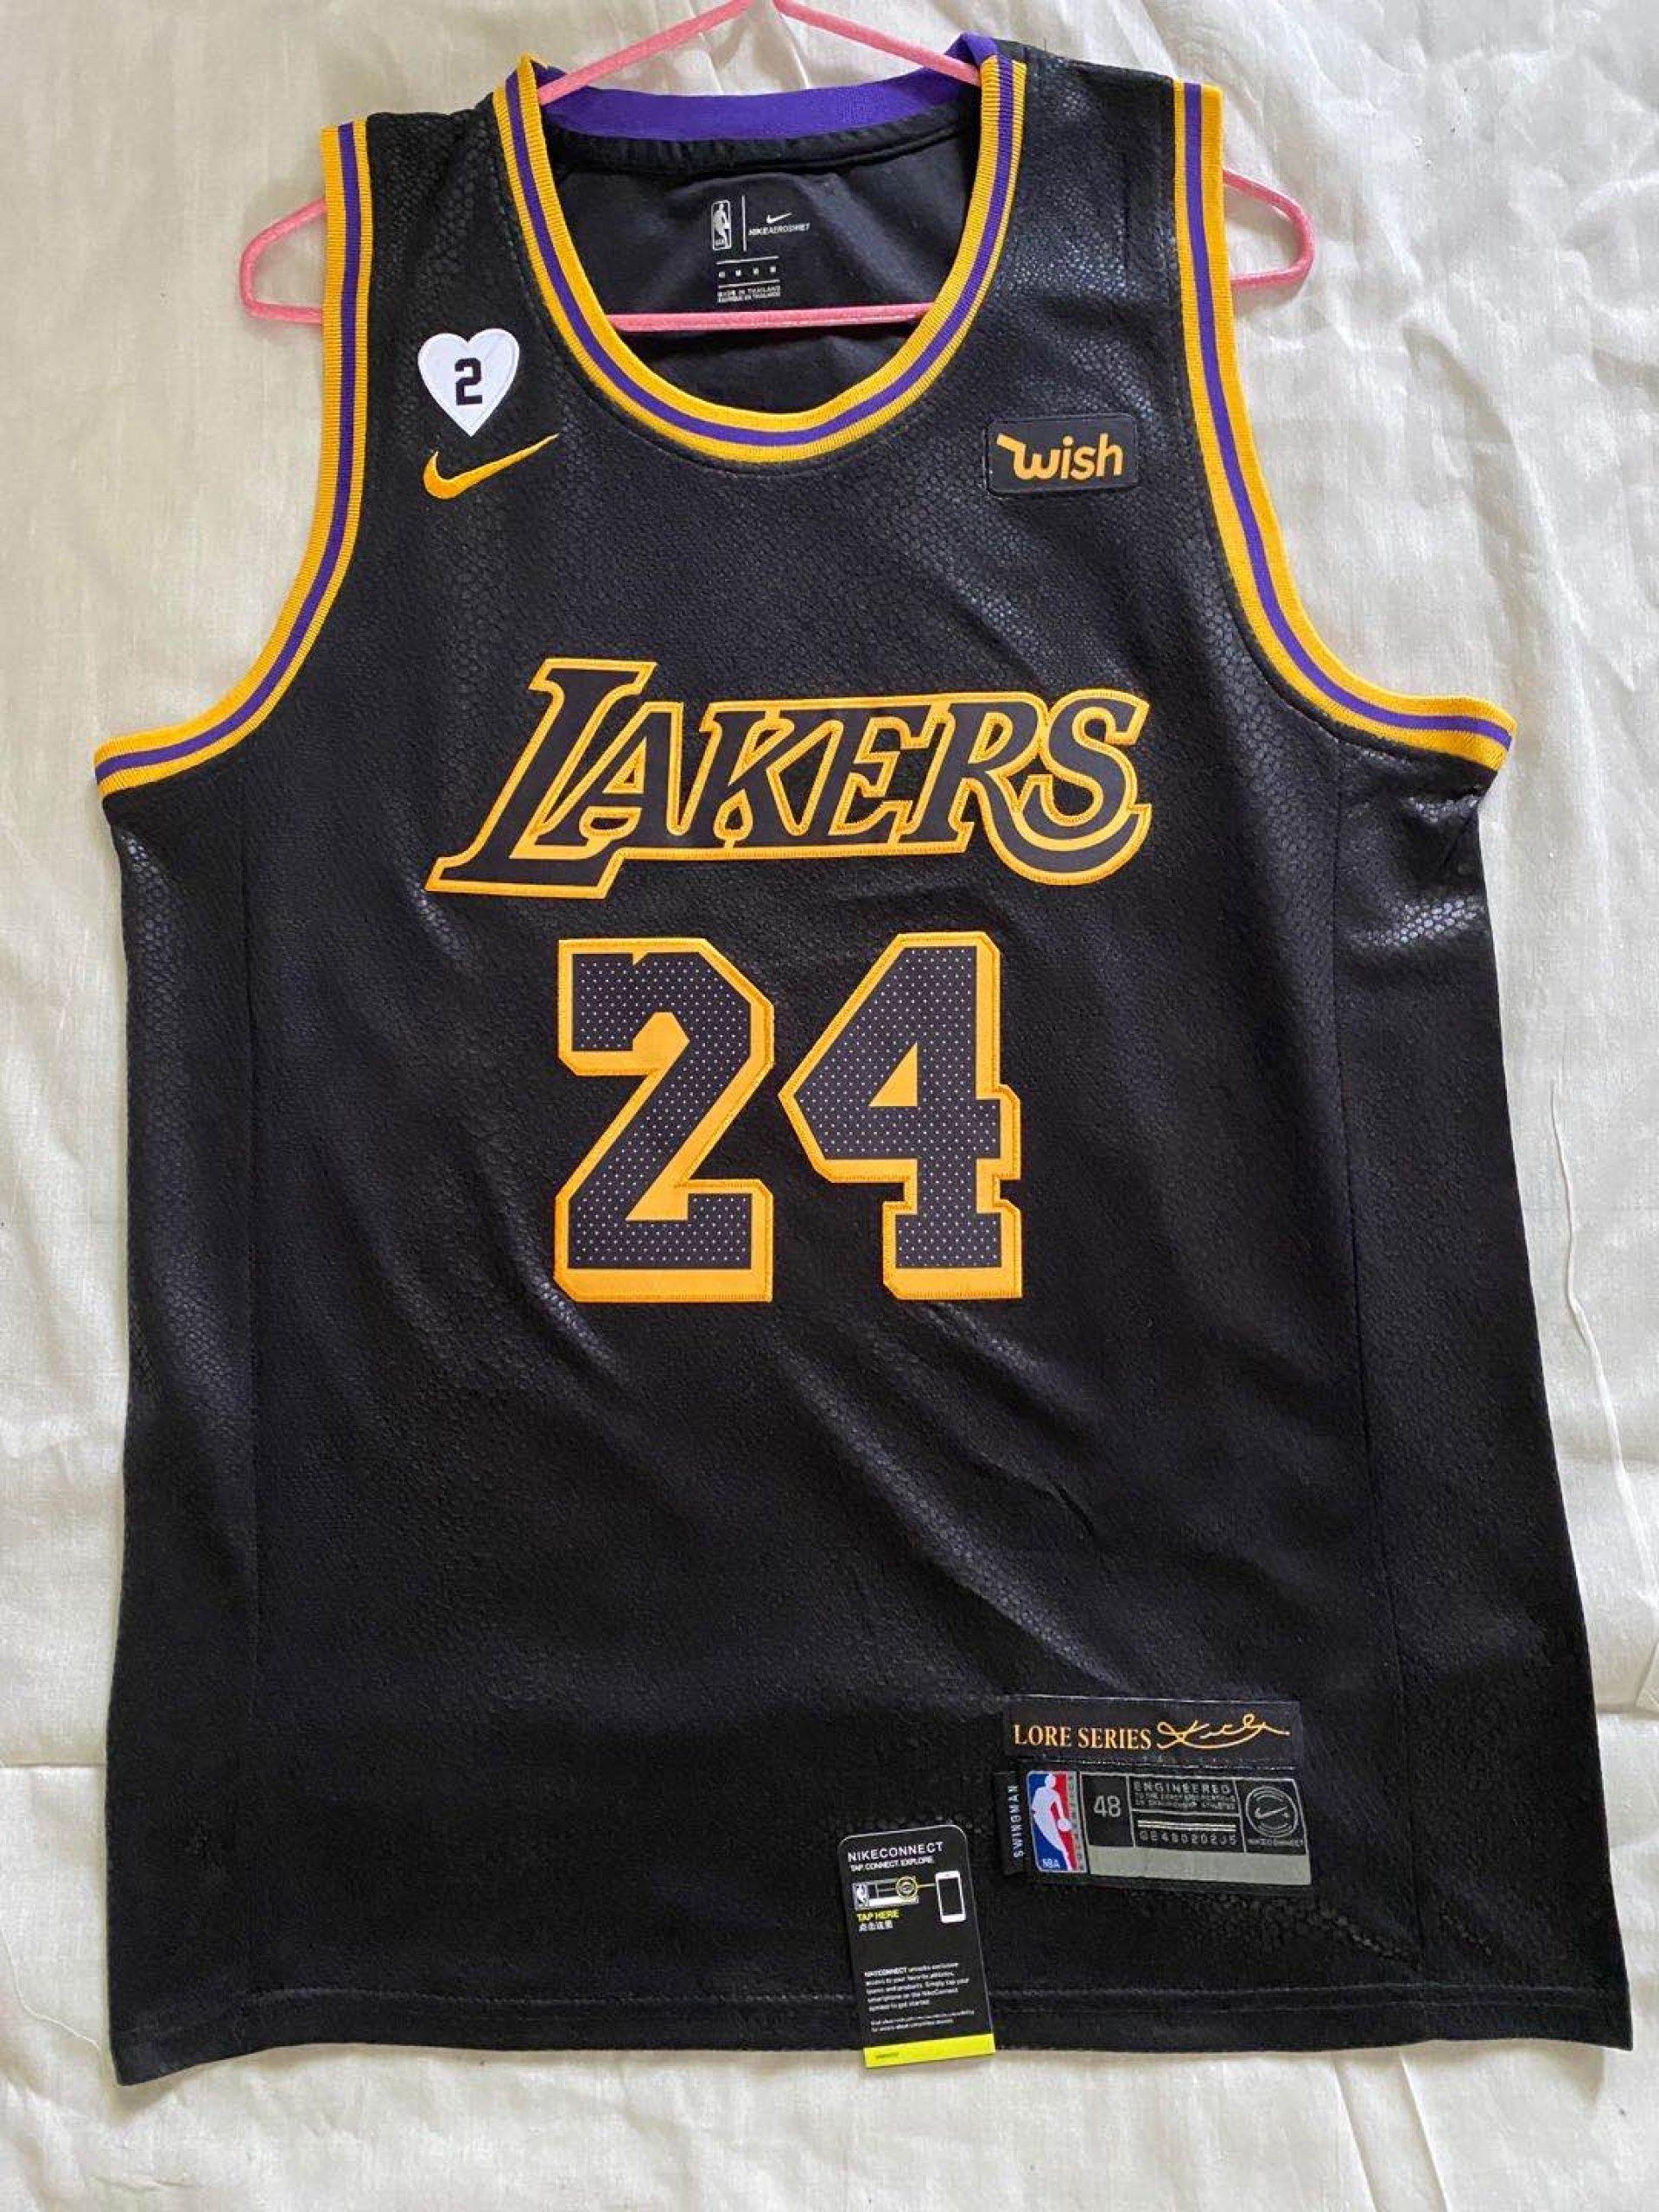 Kobe Bryant - Los Angeles Lakers #24 Black Mamba - JerseyAve ...